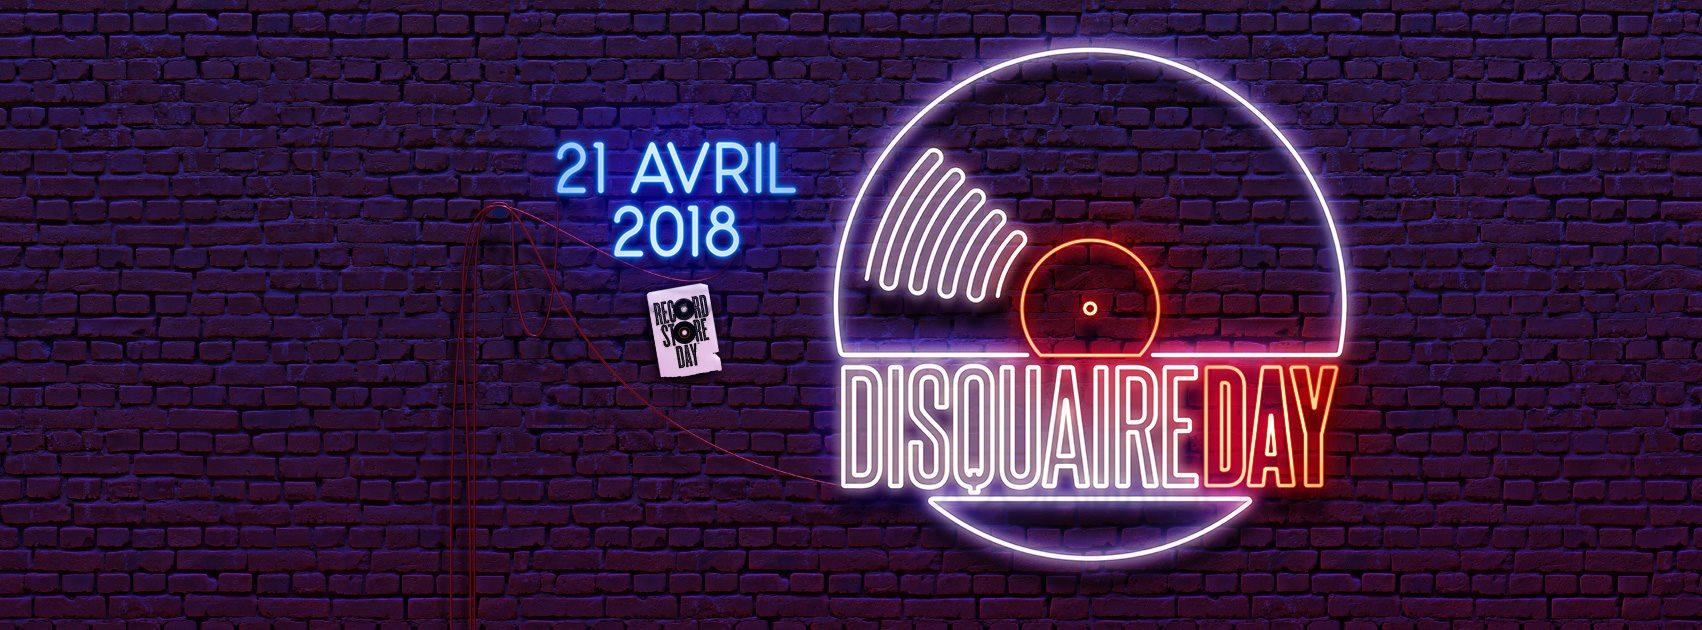 Disquaire Day 2018